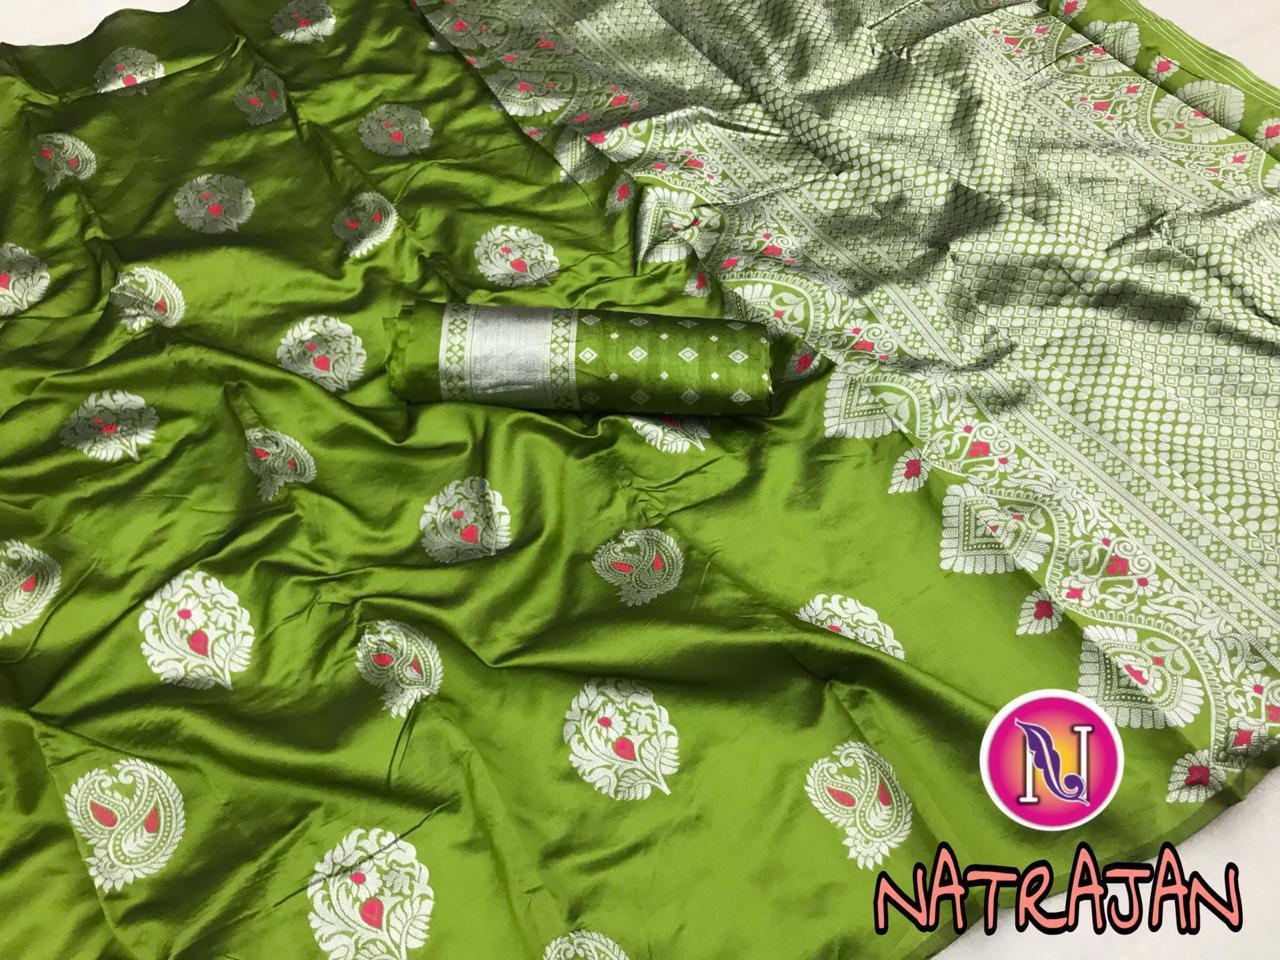 NNC- NATRAJAN saree